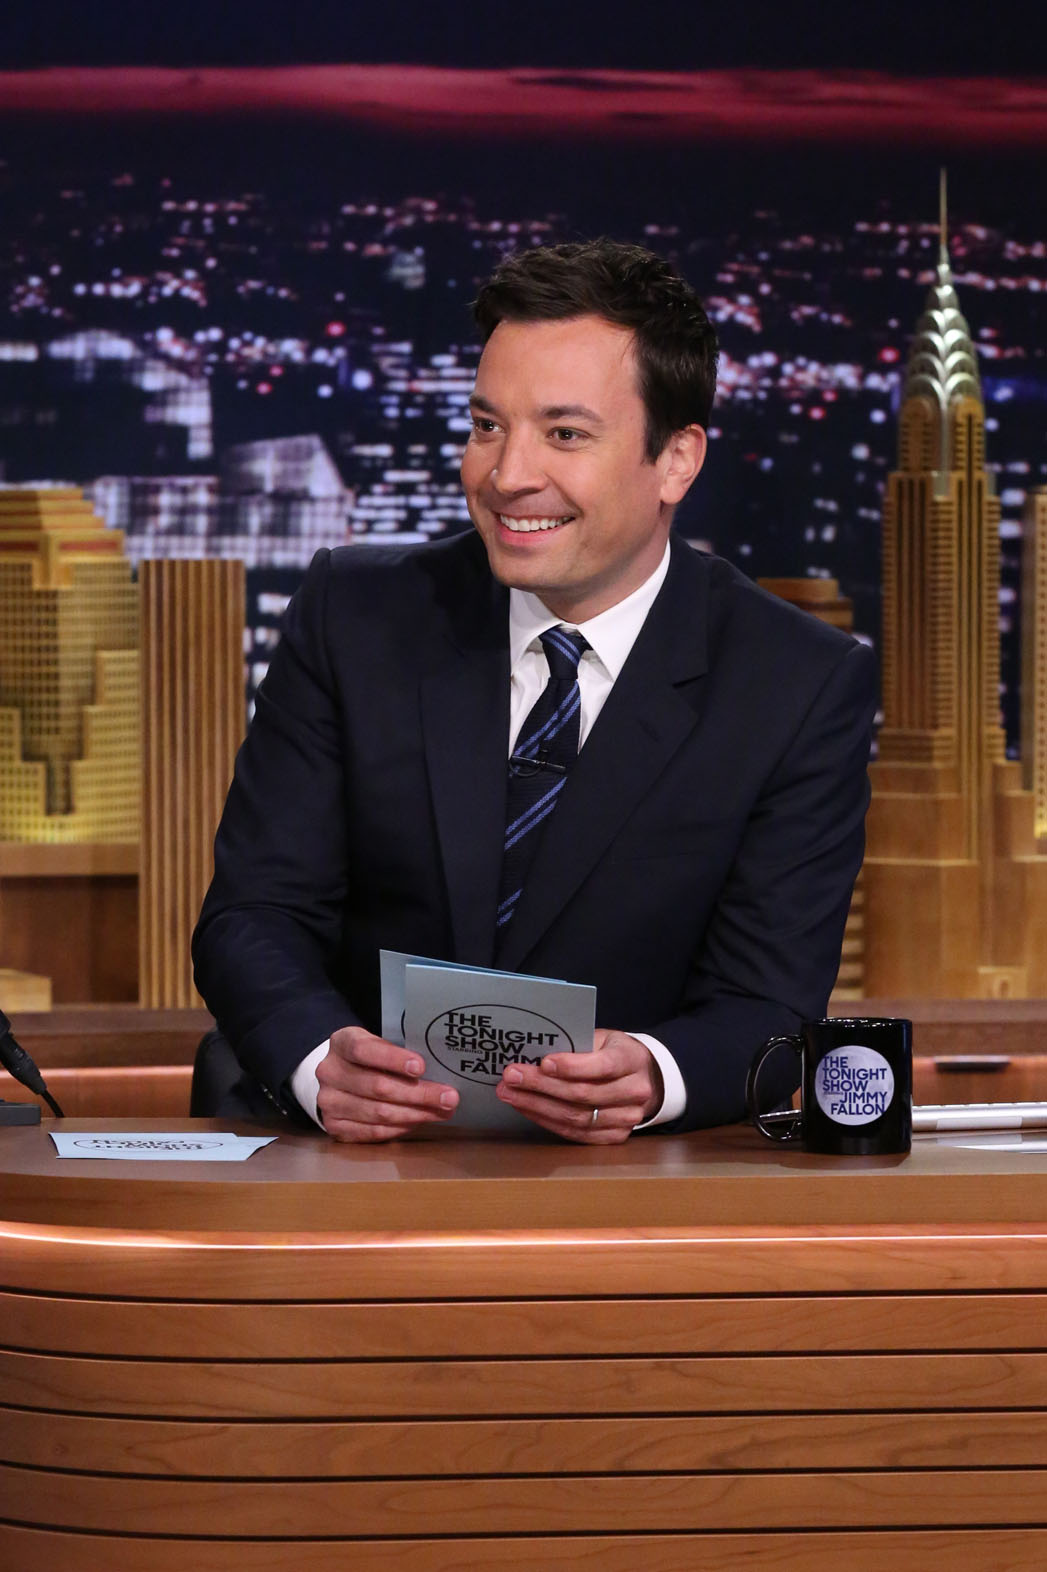 Jimmy Fallon Tonight Show NYC - P 2014